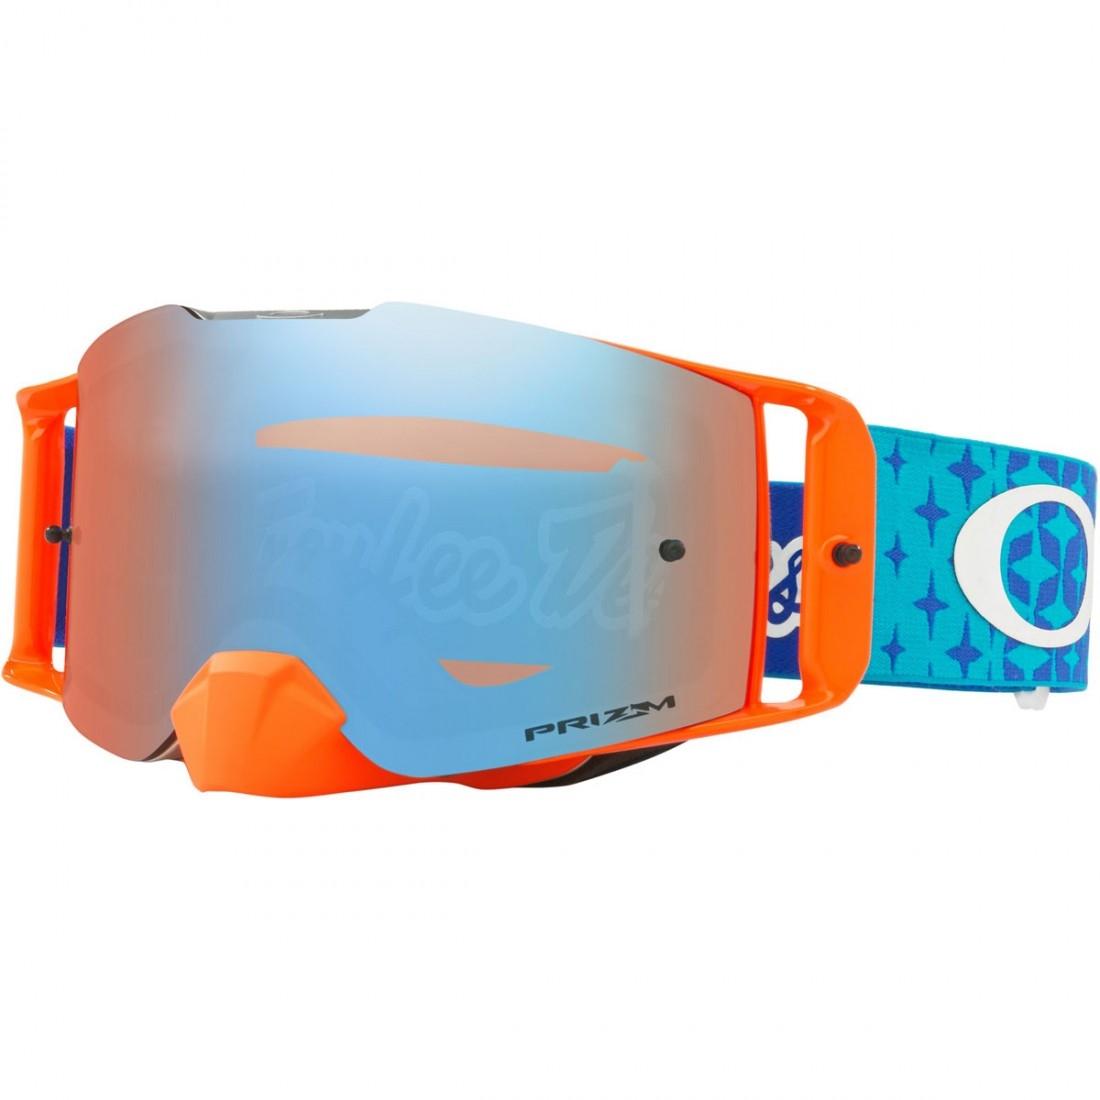 Front Lee Line Maschera Starburst Oakley Designs Troy Occhiali nPkOXNZw80